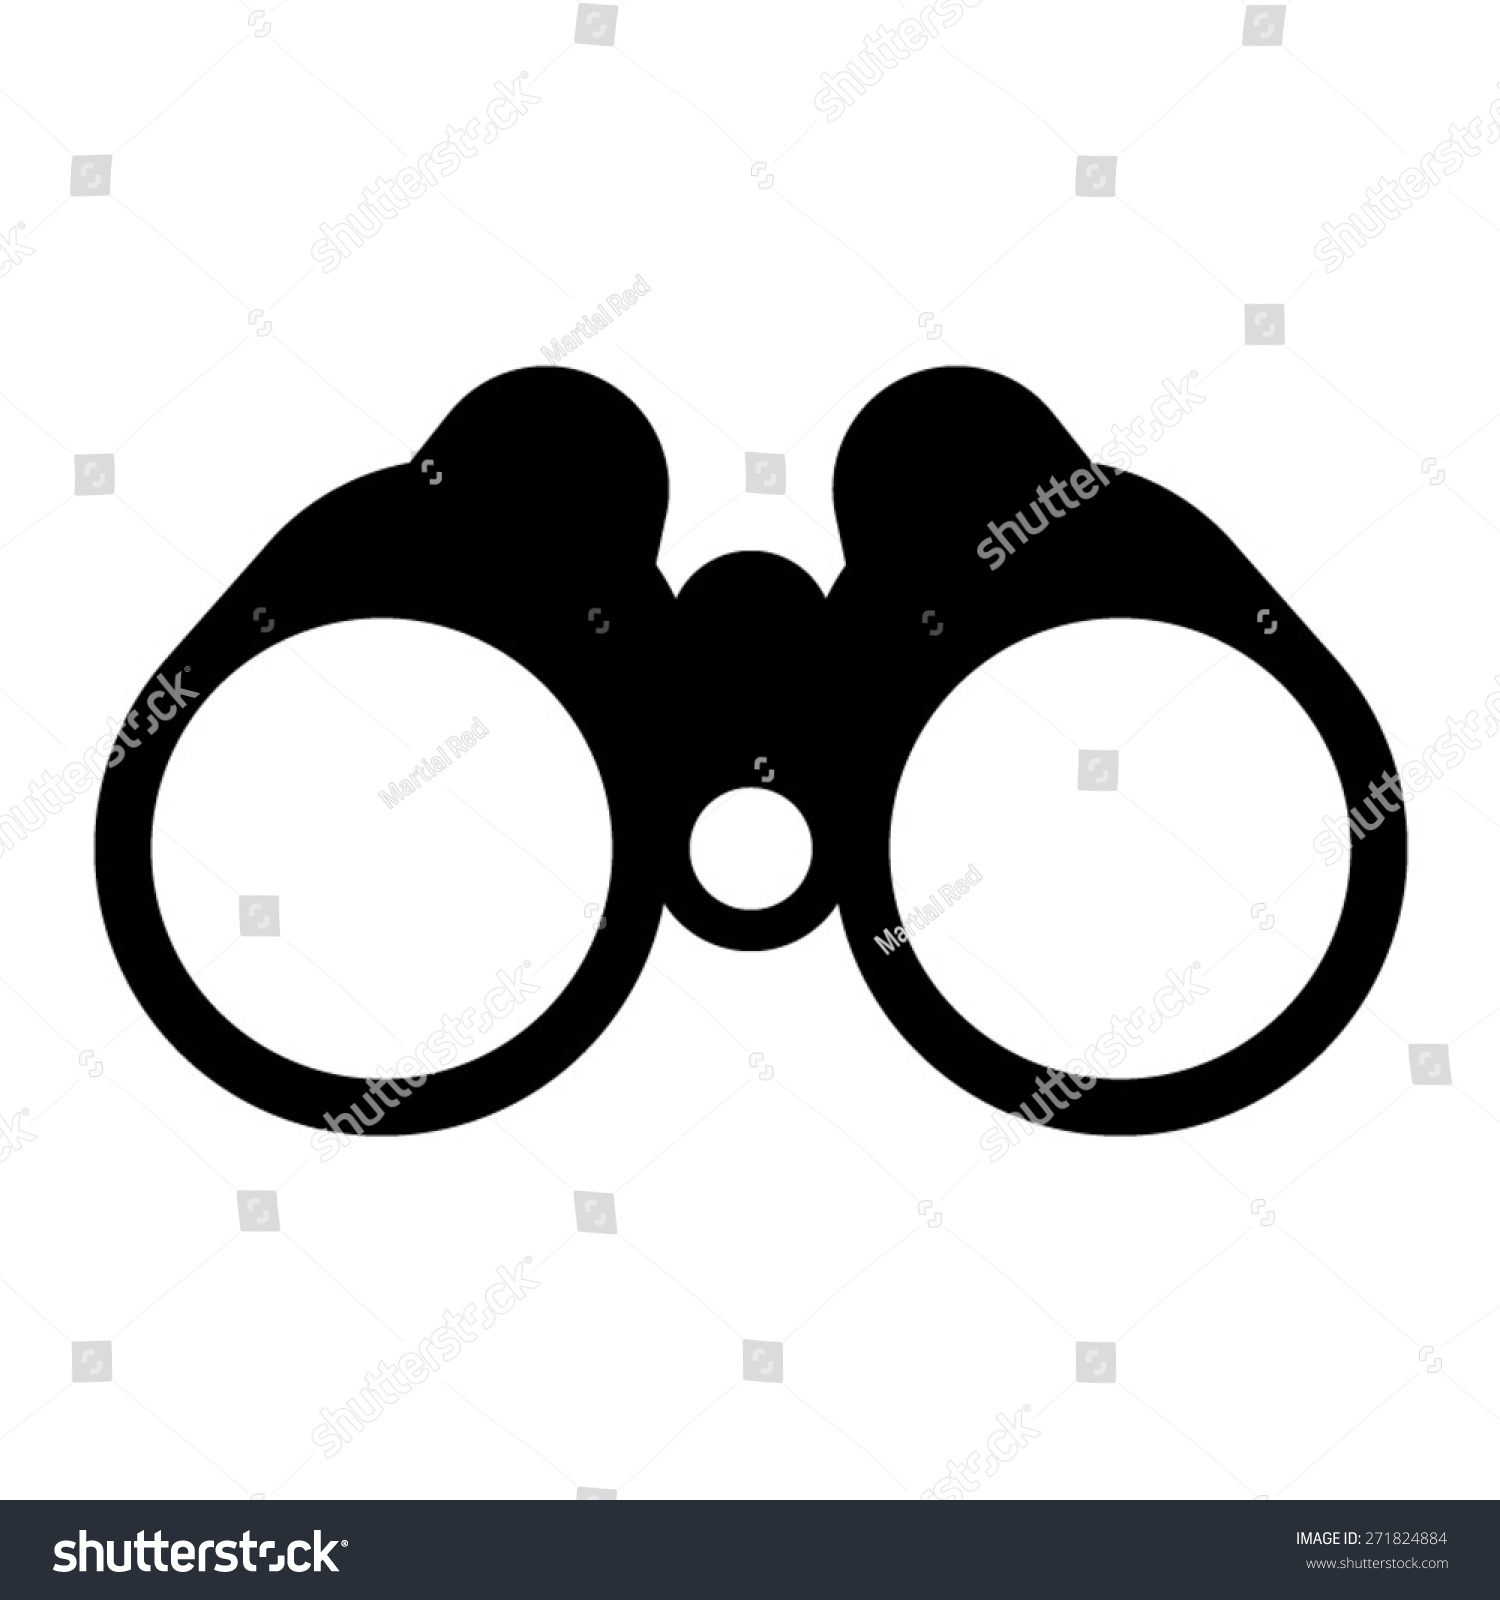 binoculars icon flat - photo #31